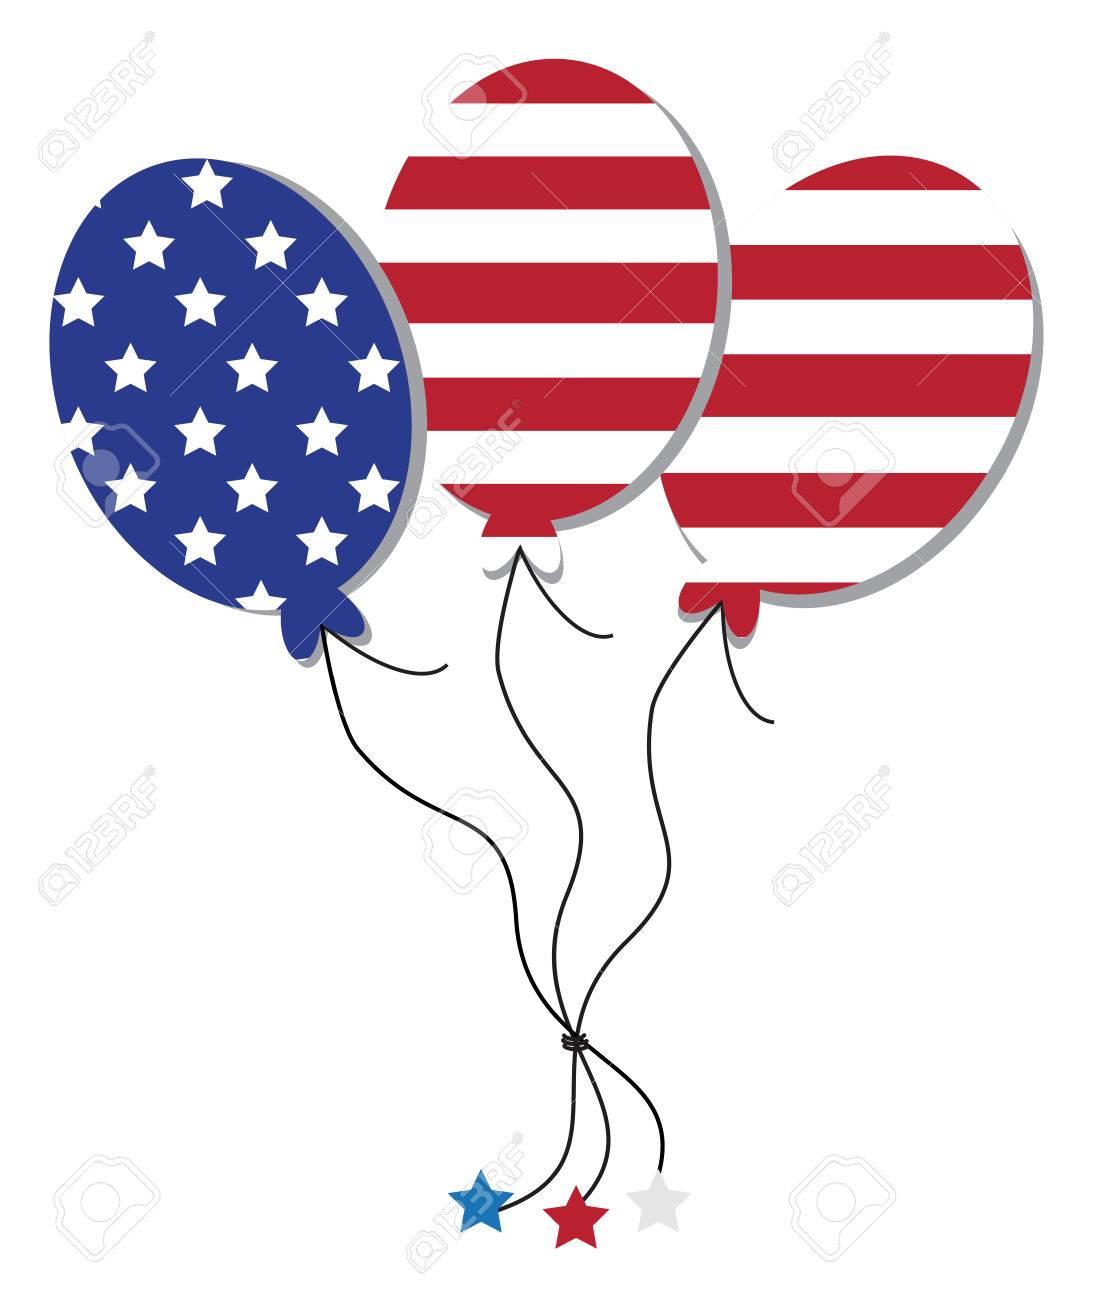 American Flag Balloons.